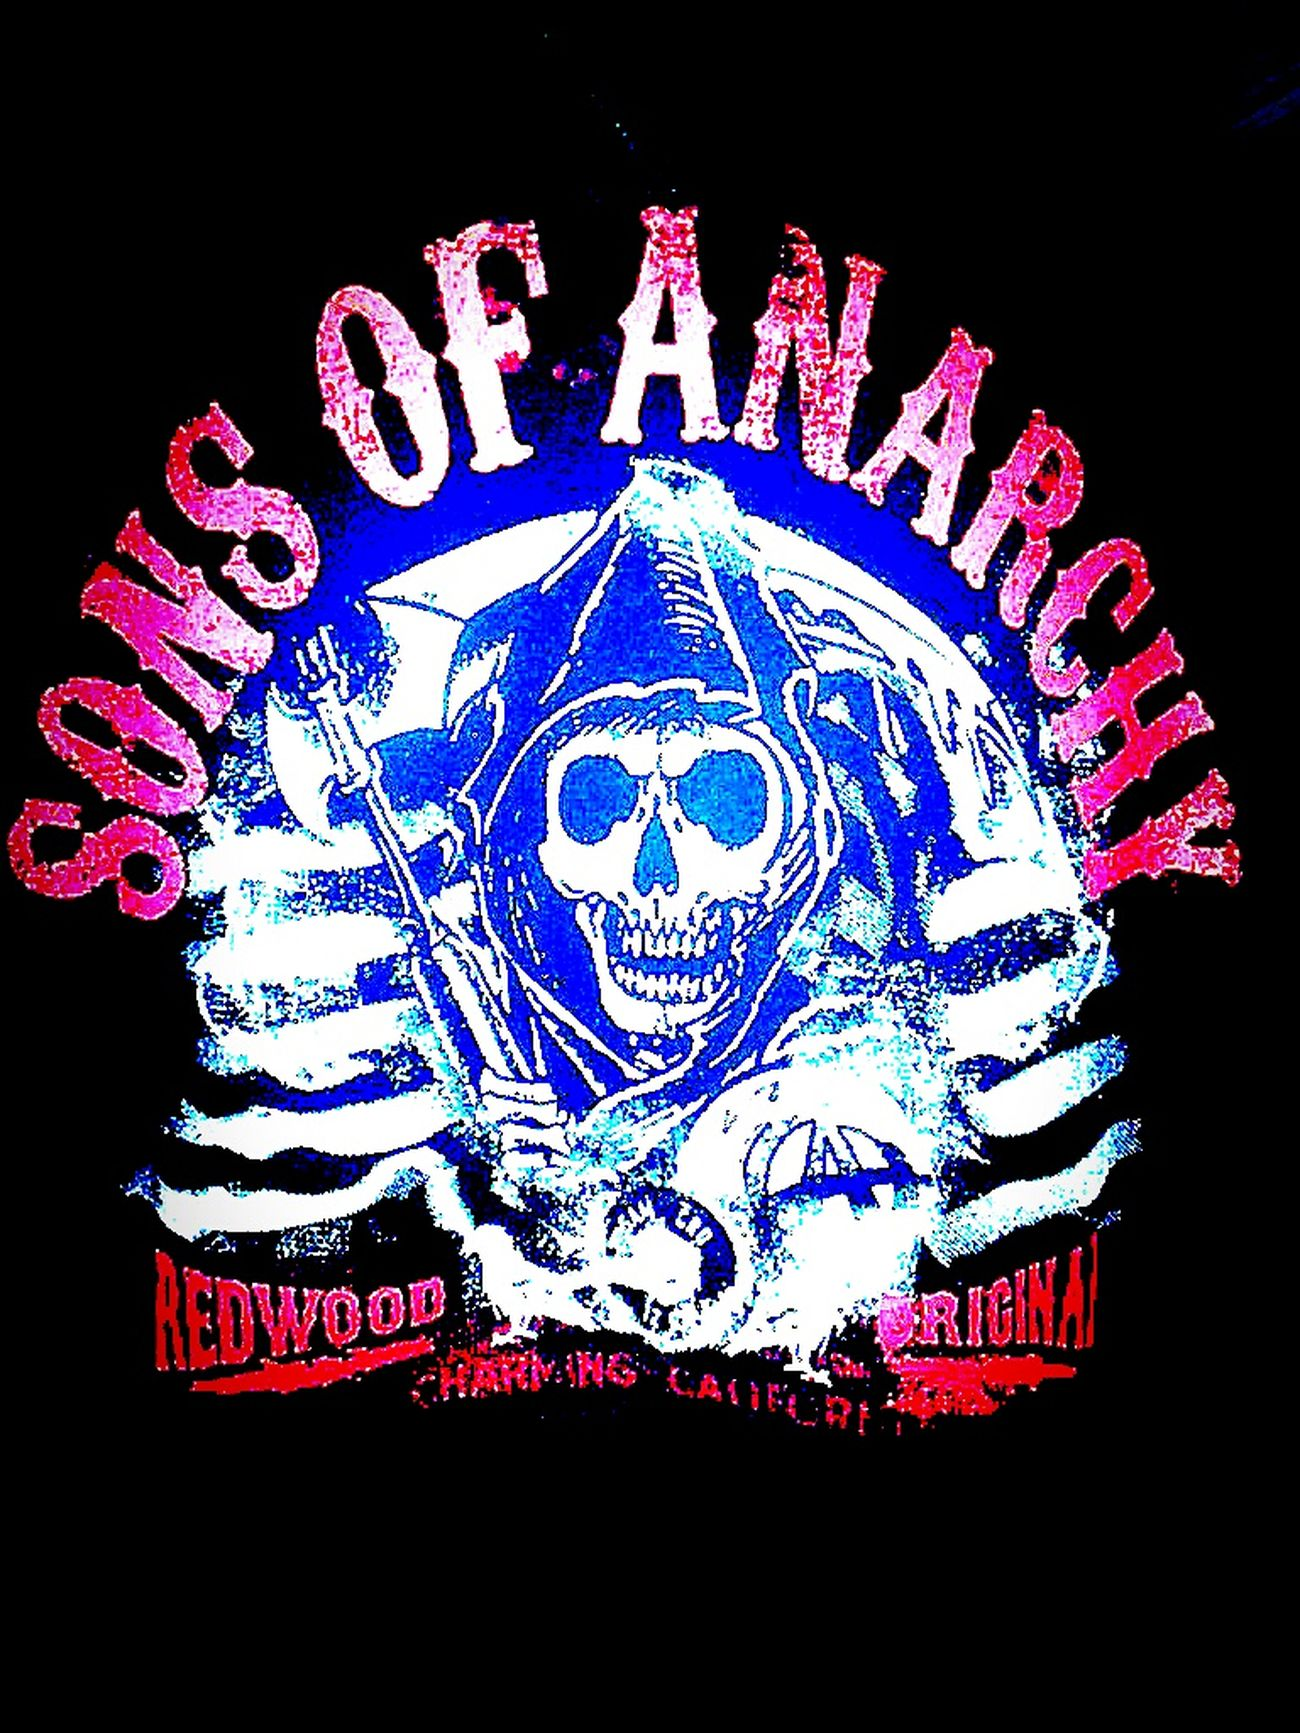 Samcro Tshirt Tee Shirt T Shirts T Shirt Tshirts Sons Of Anarchy Redwood California SoA Skull T Shirts T Shirt Tshirtoftheday Tshirt♡ T Shirt Collection SkullTshirts Skullshirt Skulls. Skullduggery Craniums Skullshit Teeshirts Skulls♥ Skulls Skullporn